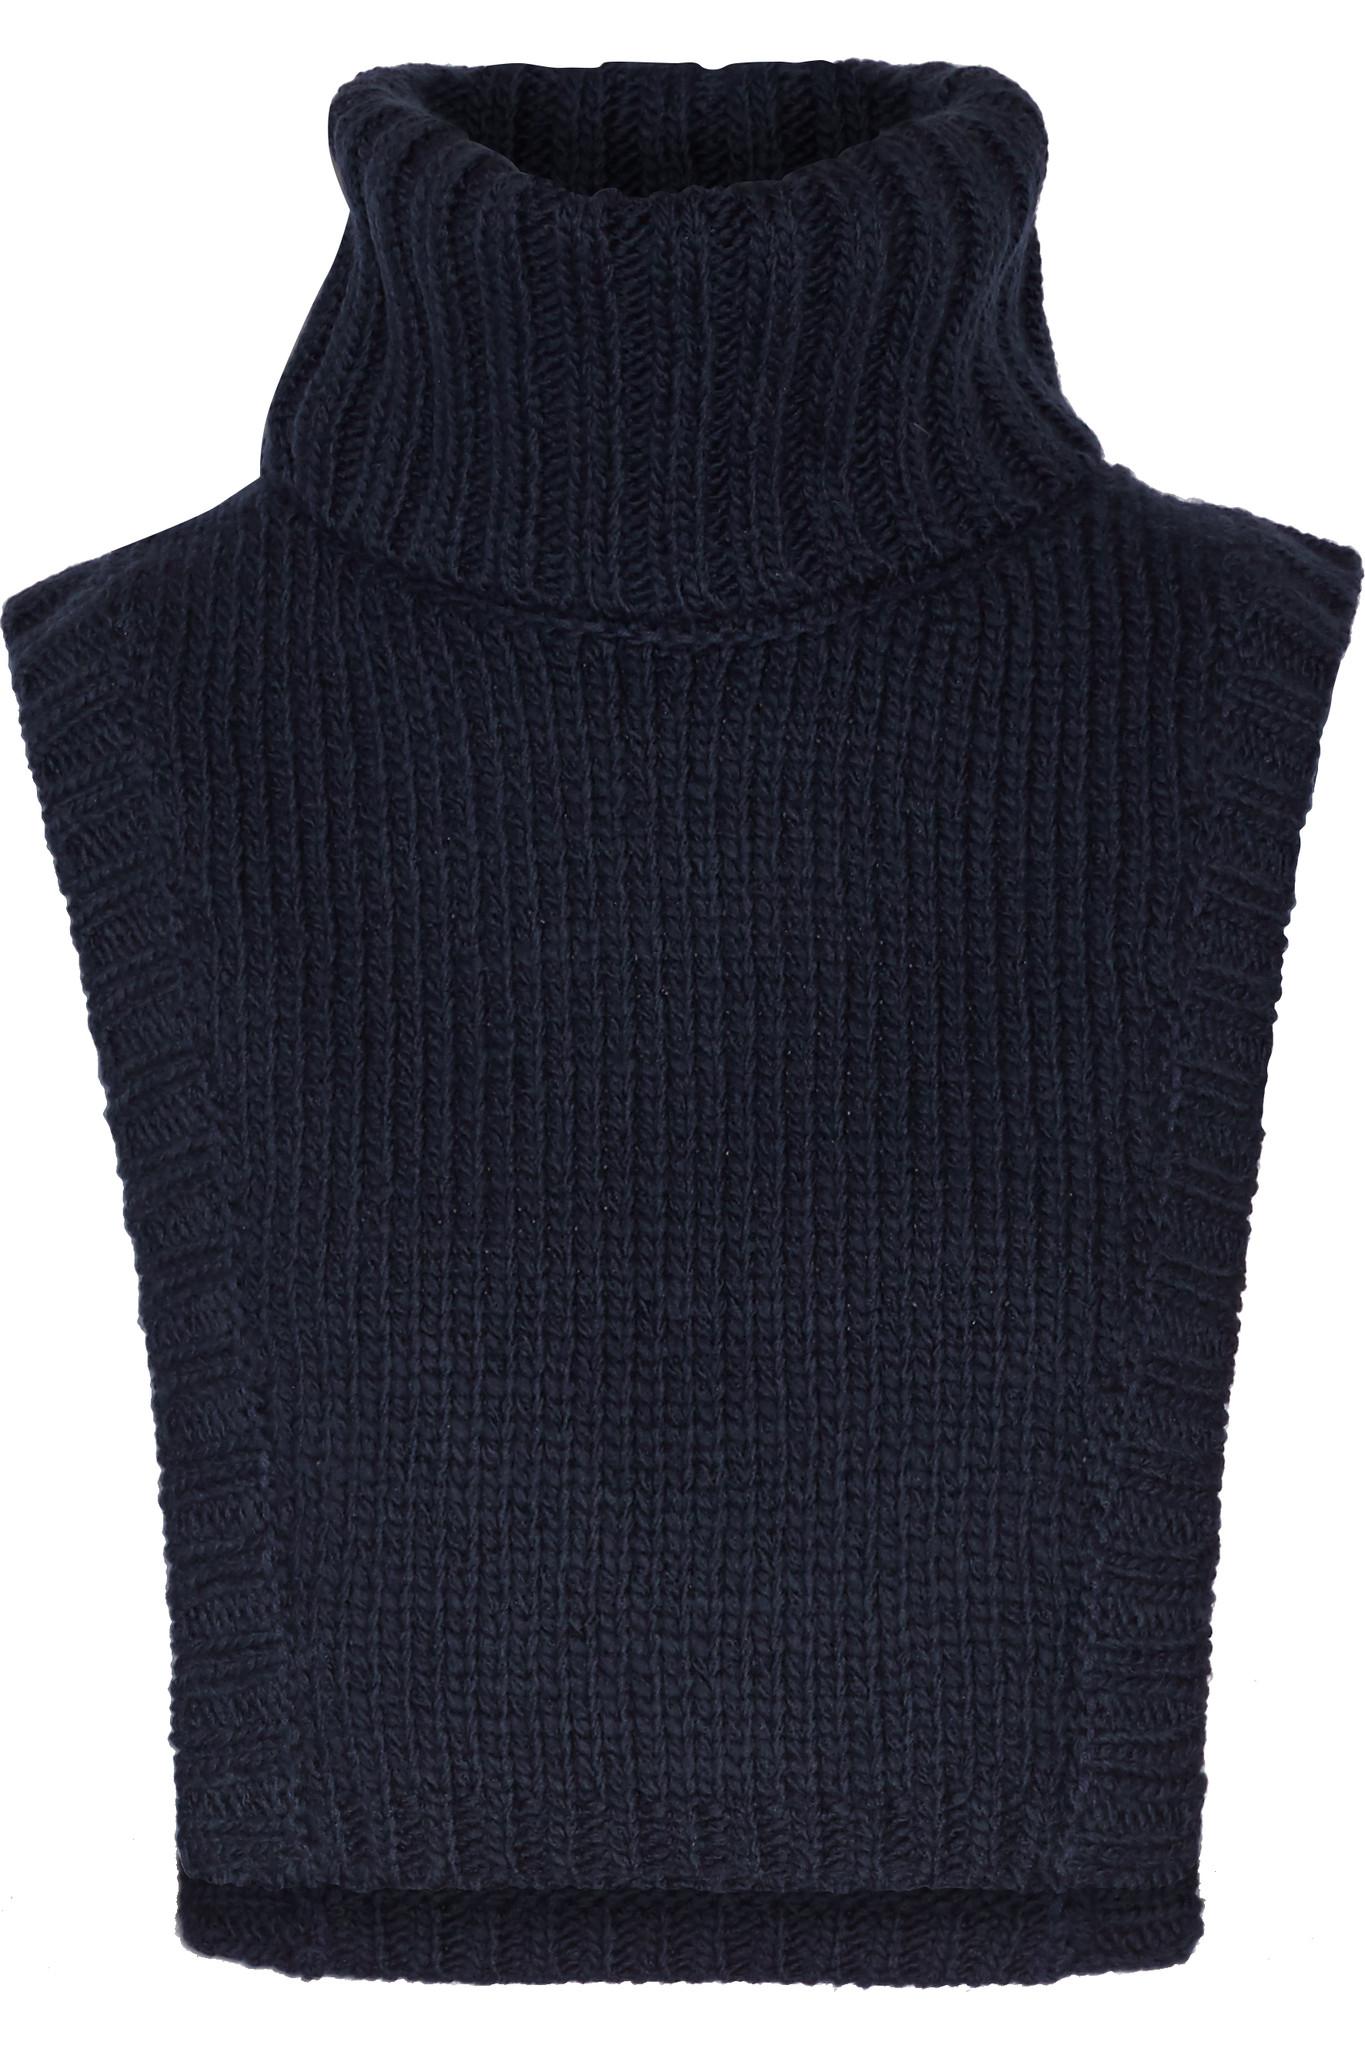 A L C Brandt Wool Blend Turtleneck Dickie In Blue Lyst